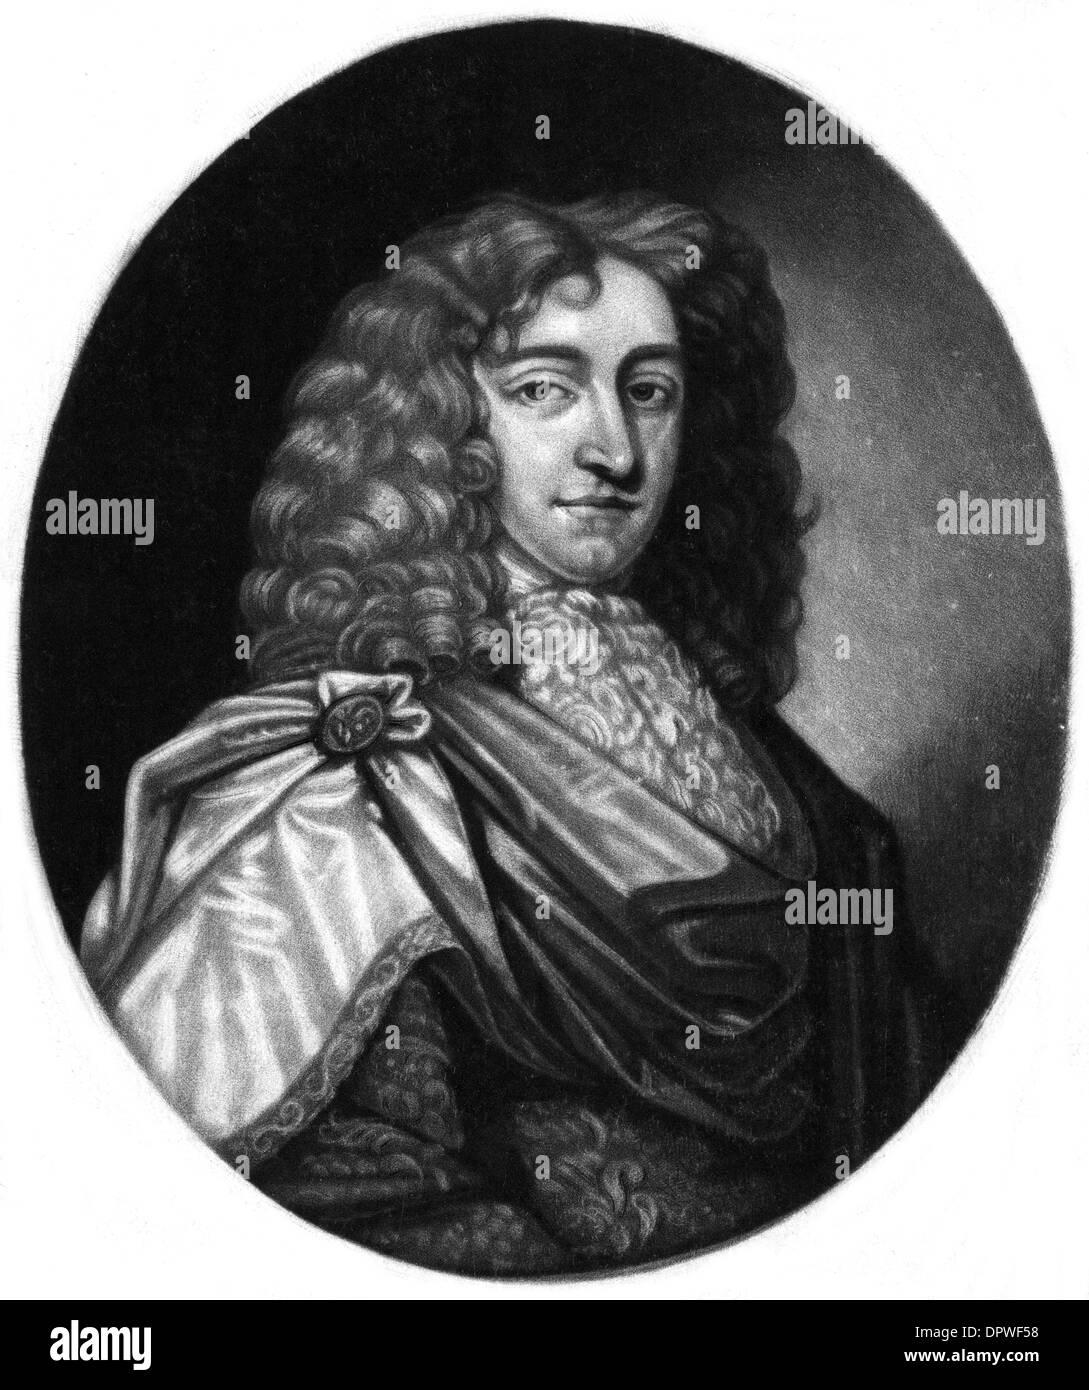 SIR WILLIAM PORTMAN - Stock Image